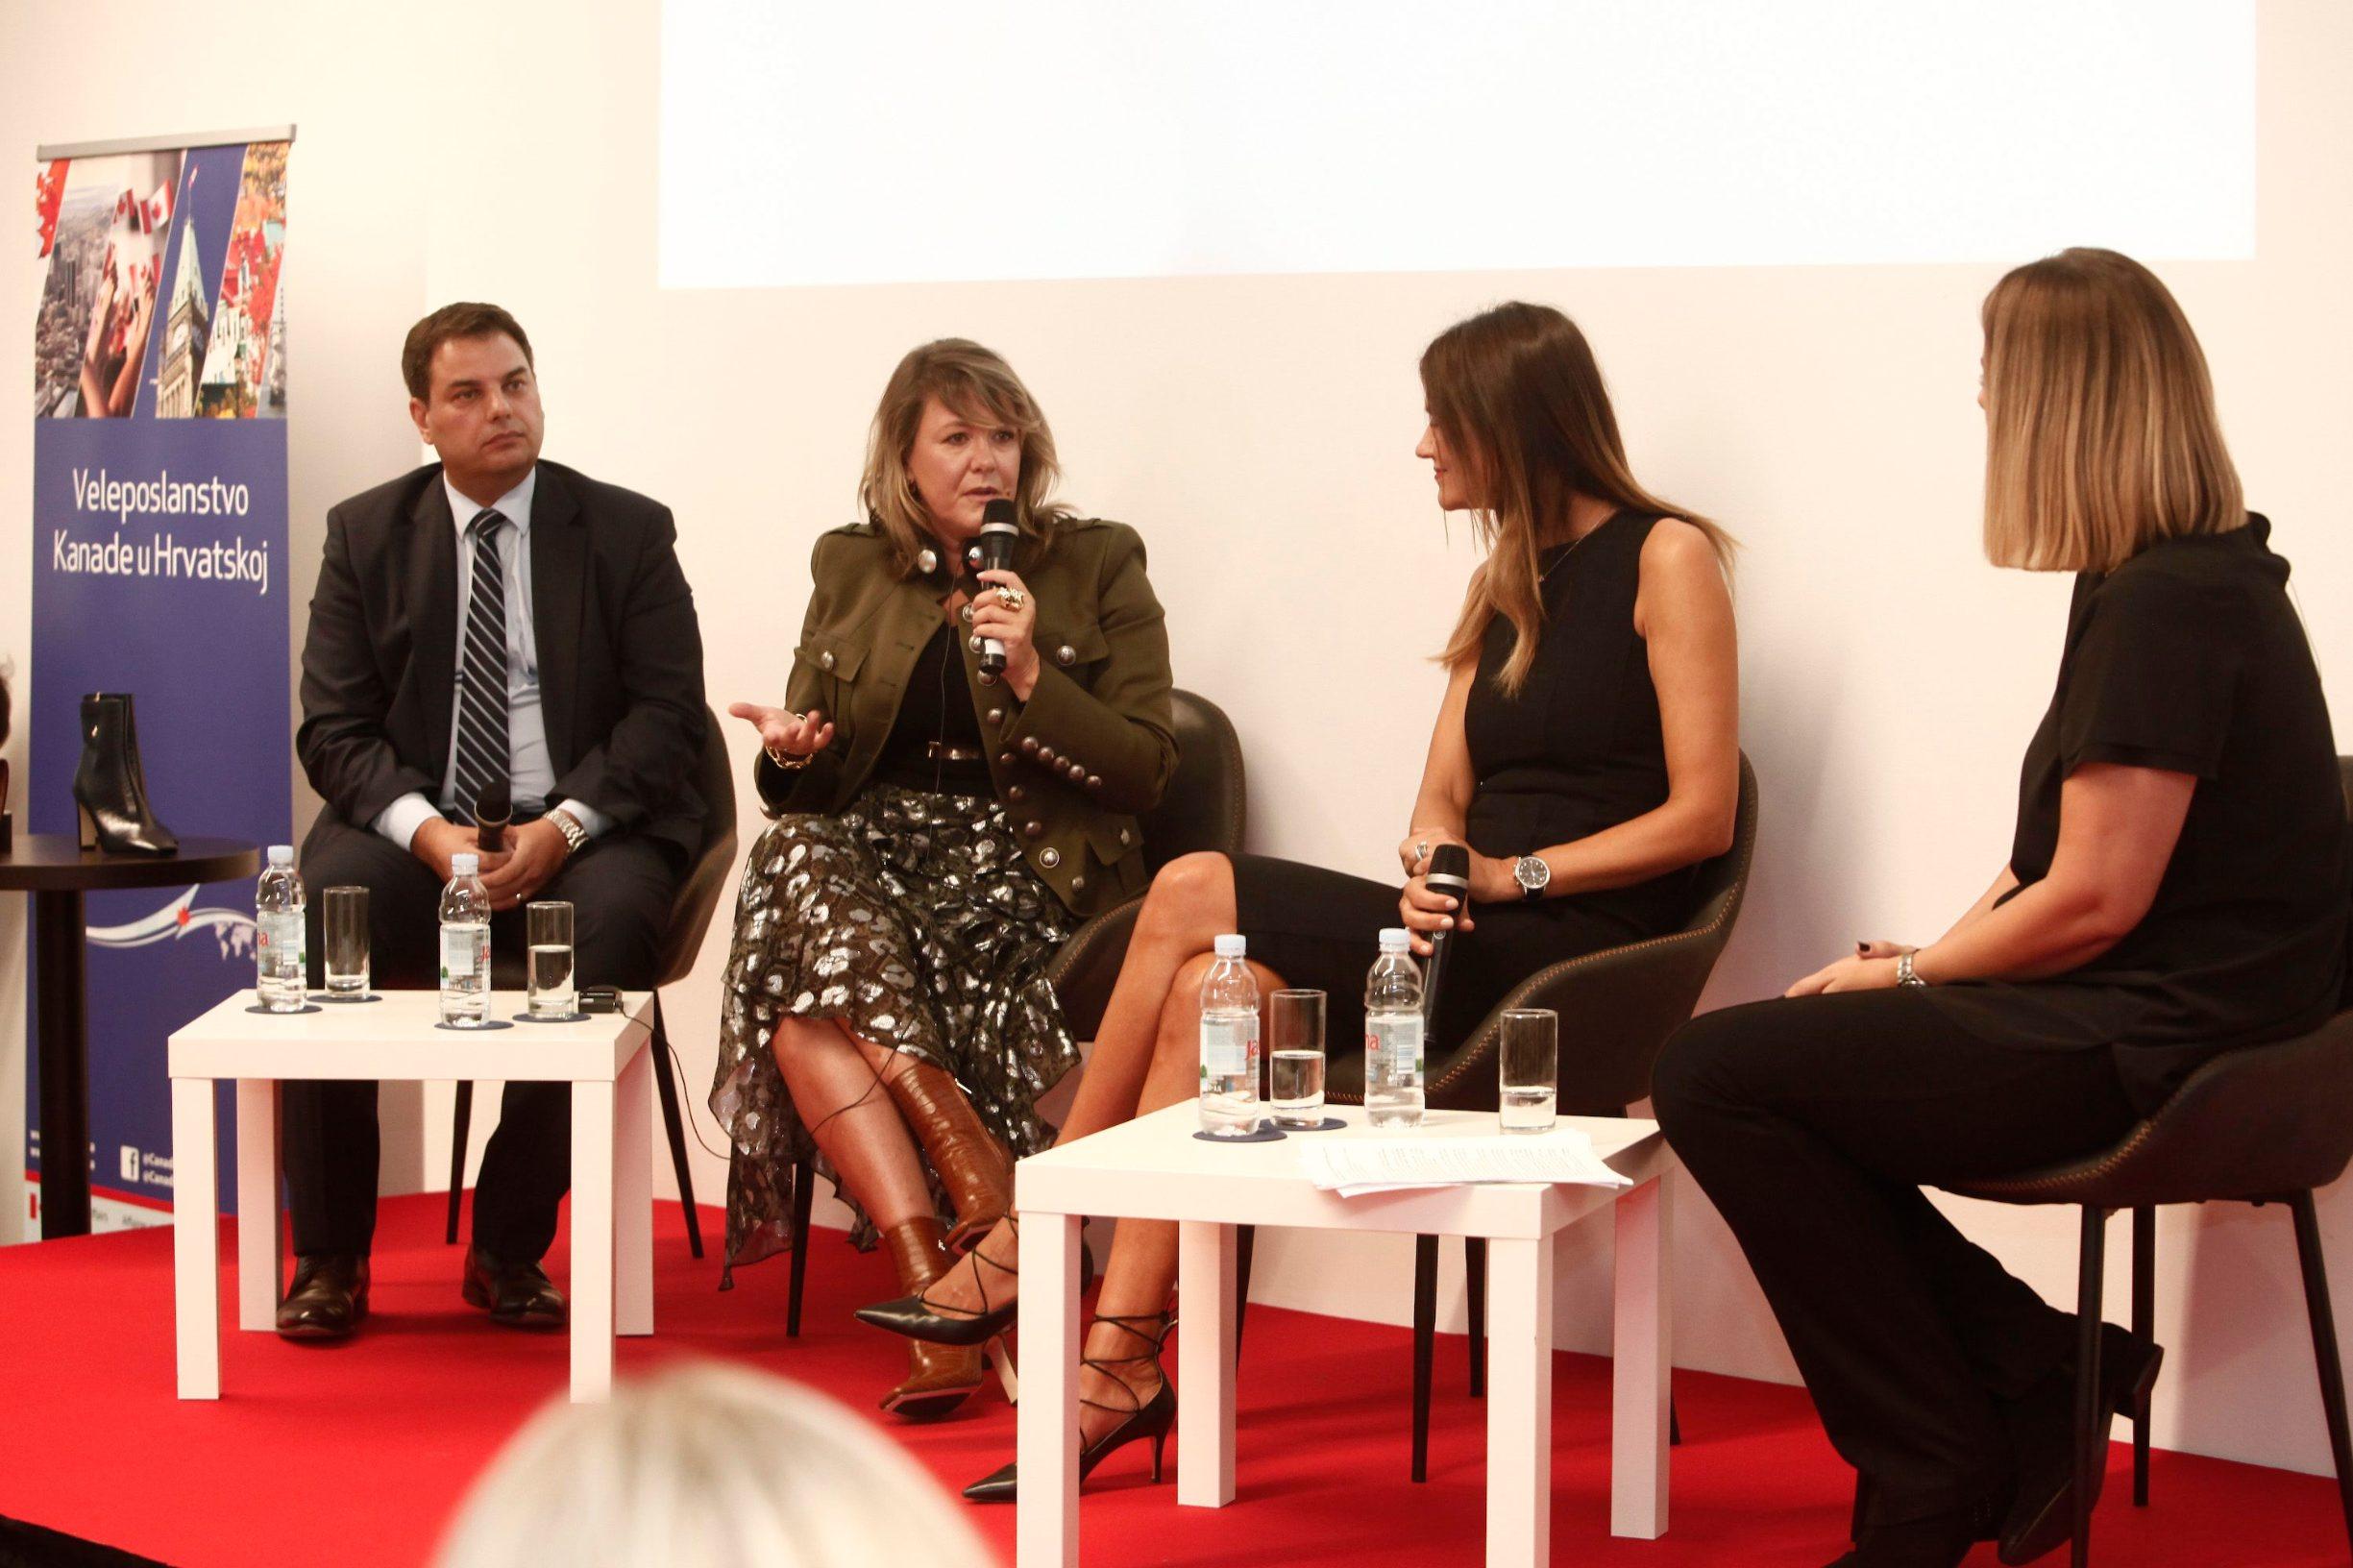 Joe Bašić, Emily Nicholson i Lada Tedeschi Fiorio u panel raspravi Ravnopravnost prilika radi ostvarivanja najboljih poslovnih rezultata